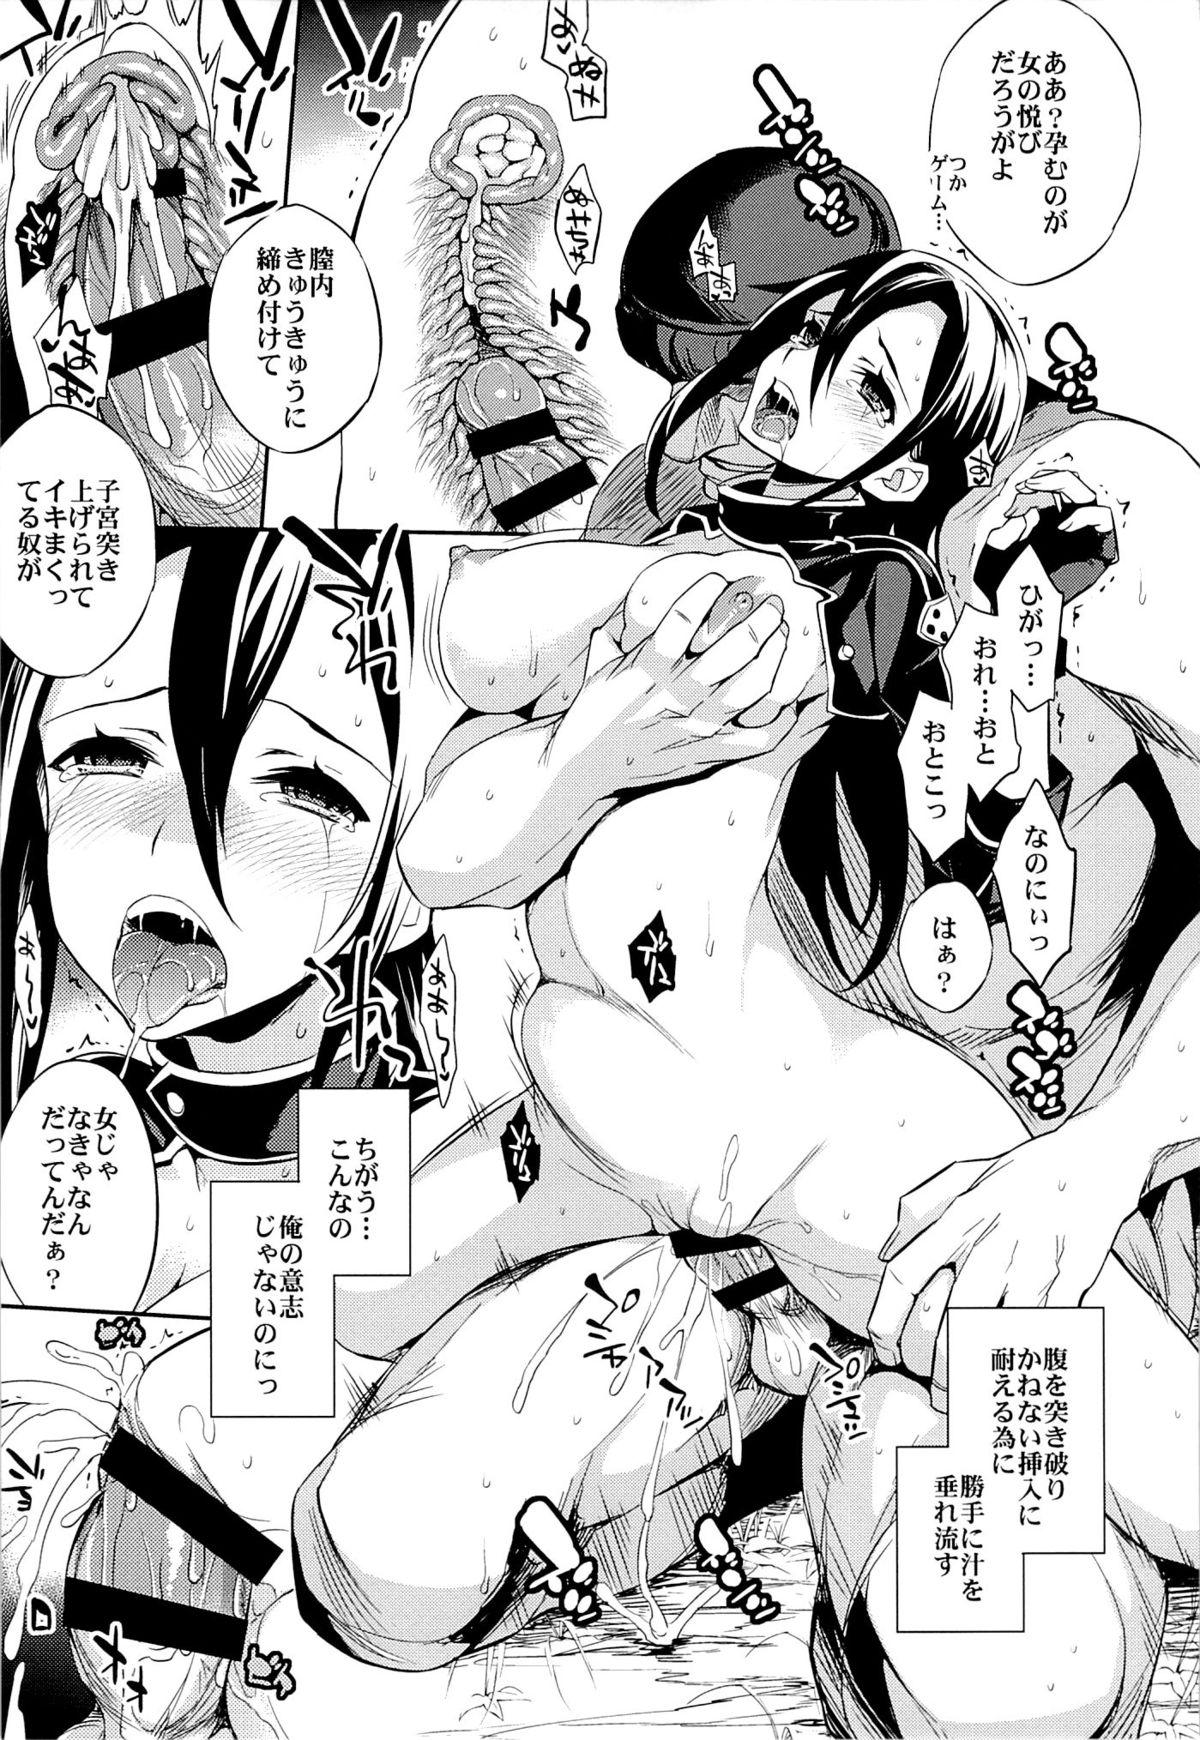 (SC65) [Crazy9 (Ichitaka)] C9-14 TS~Kirito-chan no Avatar wa Random Nyotai (Sword Art Online) 10